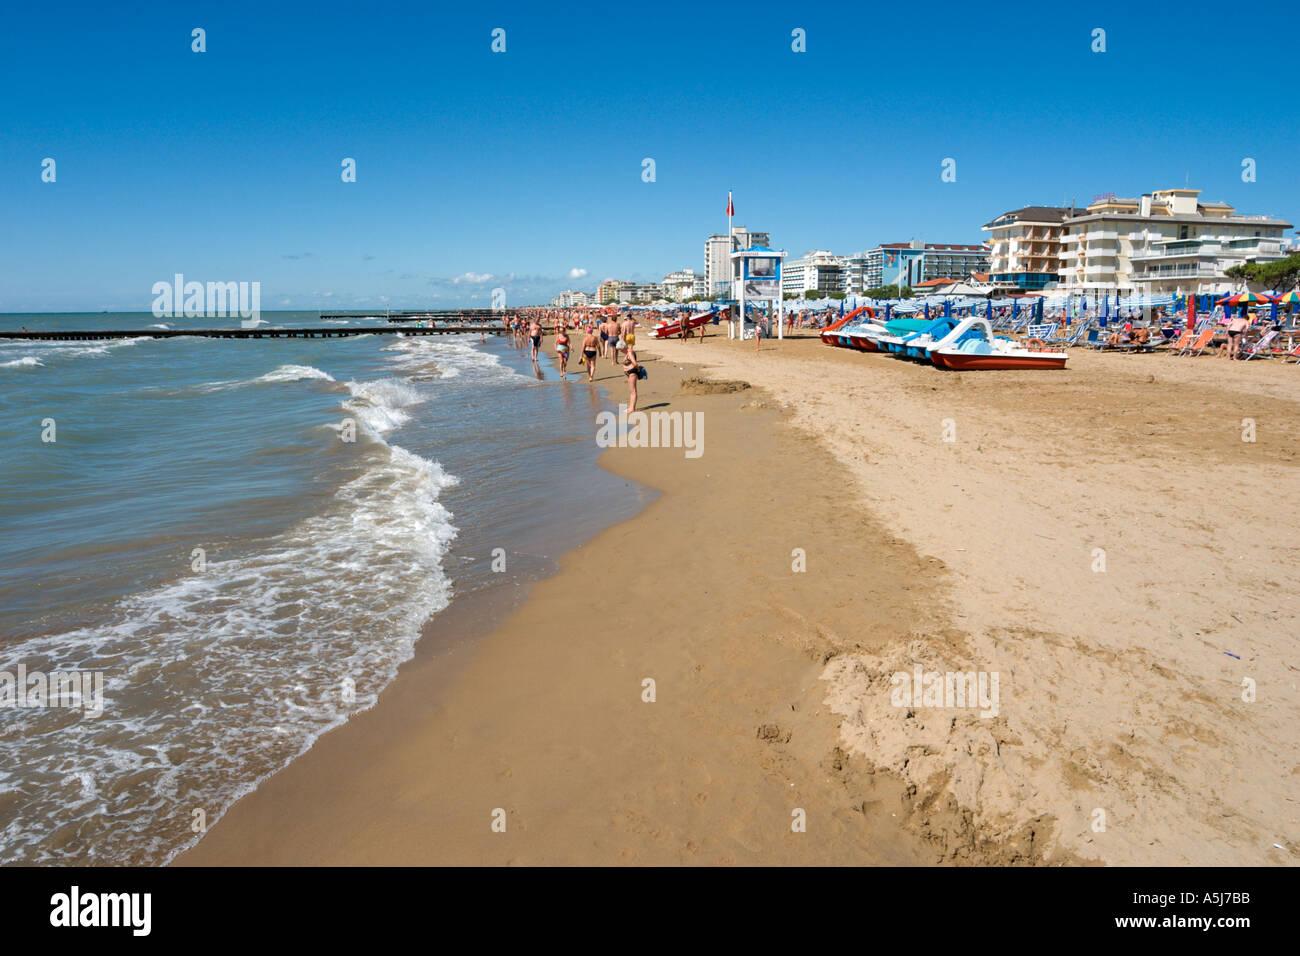 Beach, Lido de Jesolo, Venetian Riviera, Italy Stock Photo